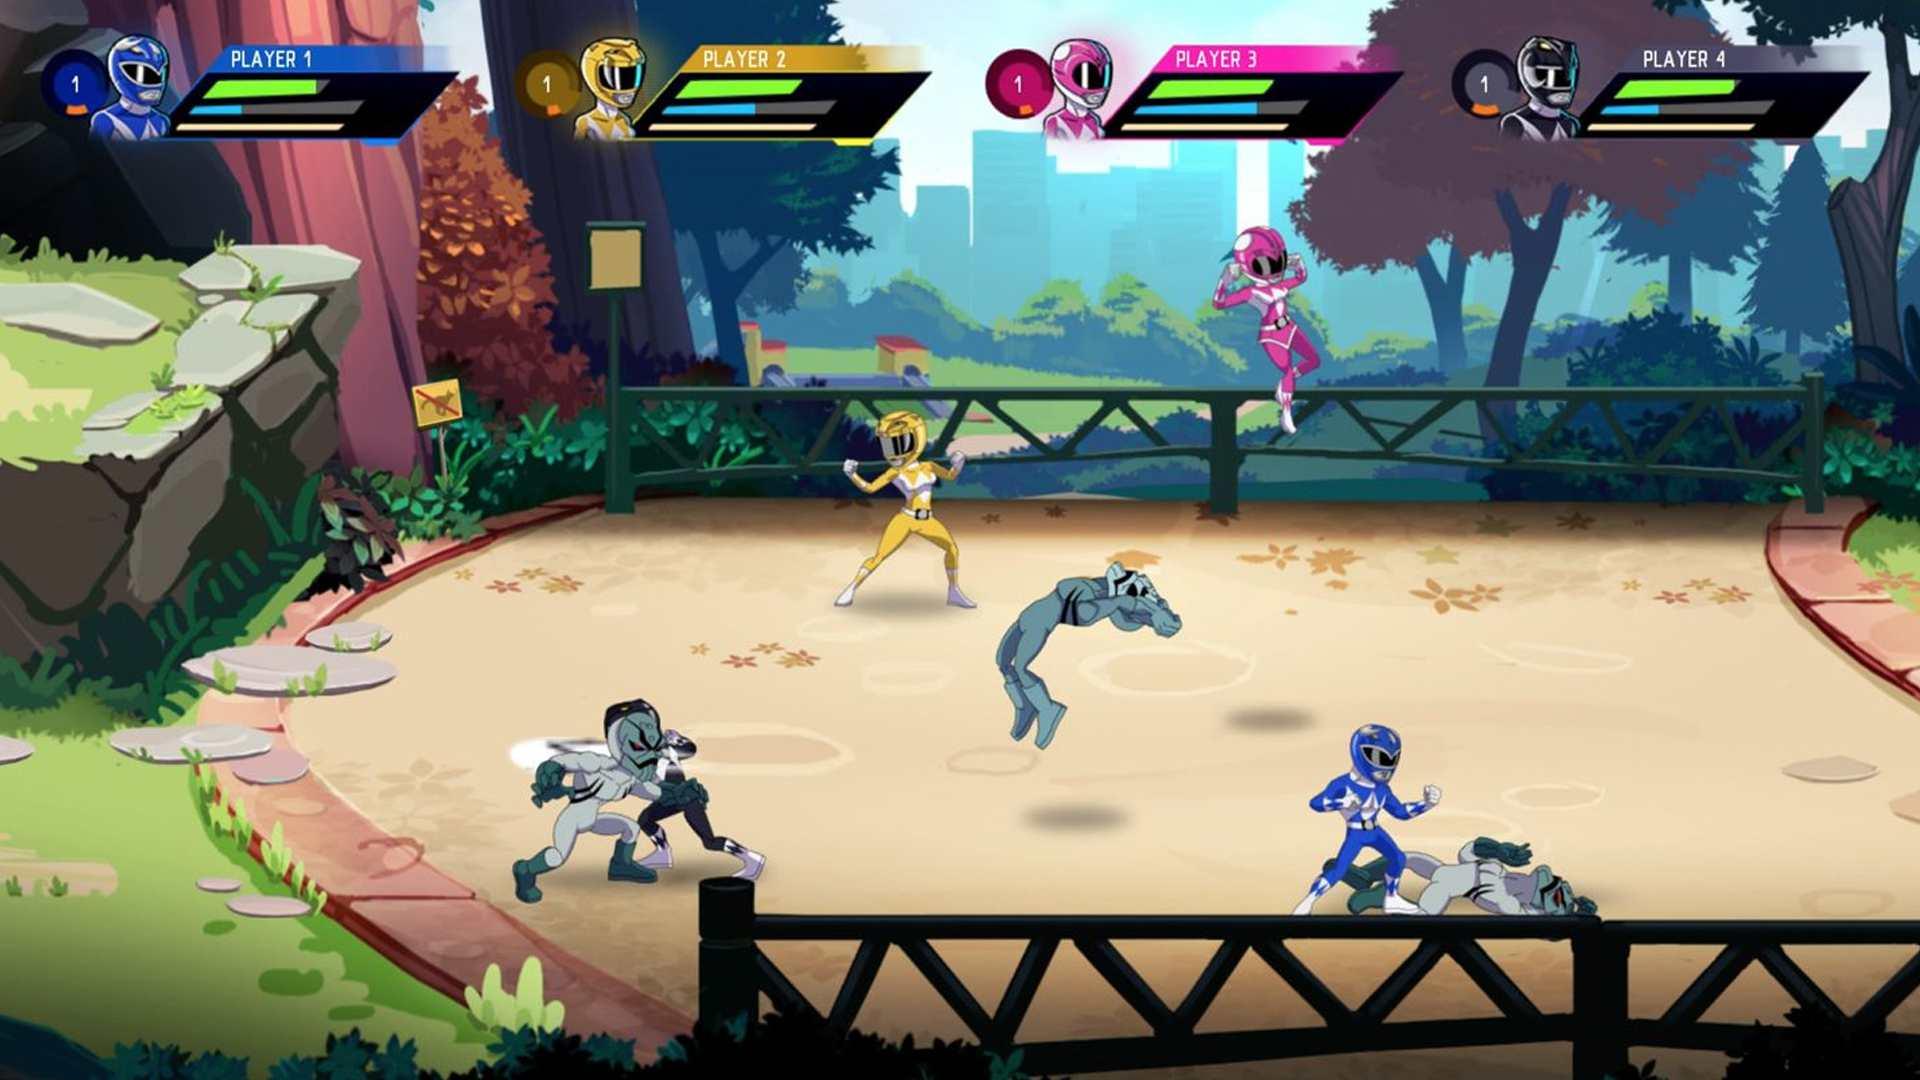 Sabans mighty morphin power rangers mega battle offline video game for kids